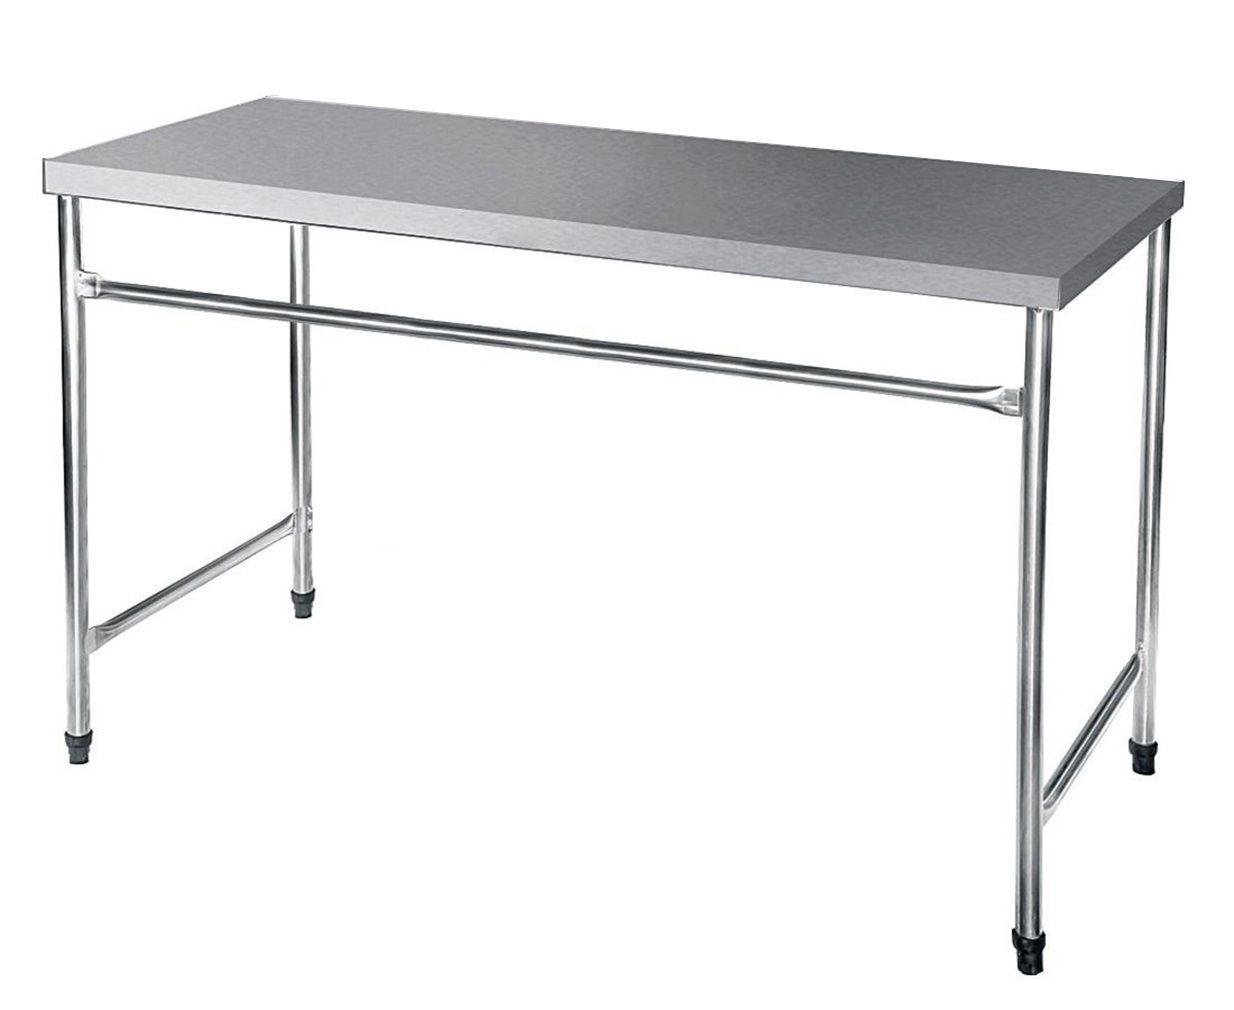 Bancada / Mesa Em Aço Inox (160x60x85)